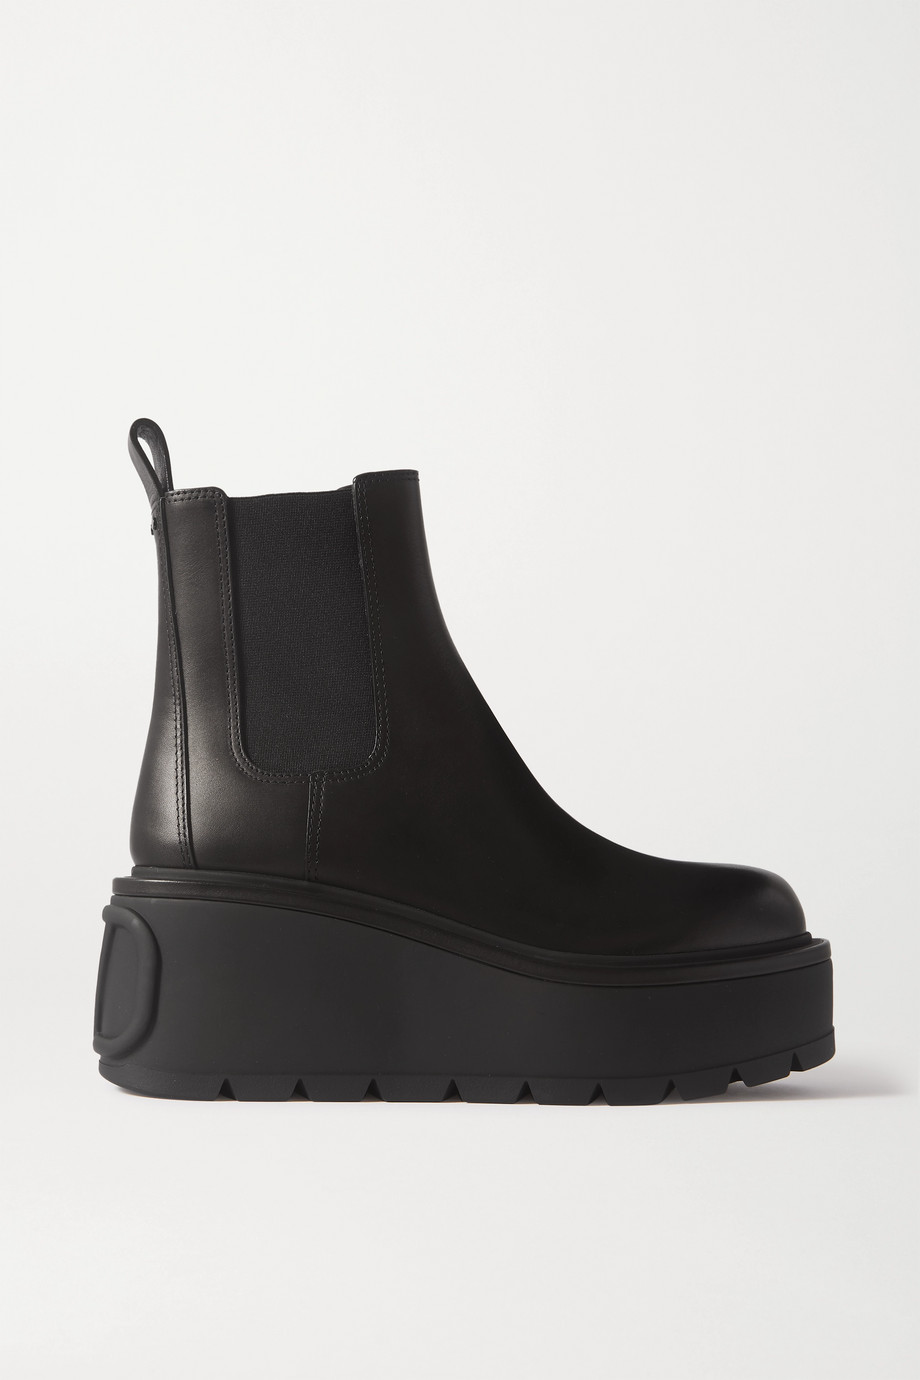 Valentino Valentino Garavani 55 leather platform Chelsea boots